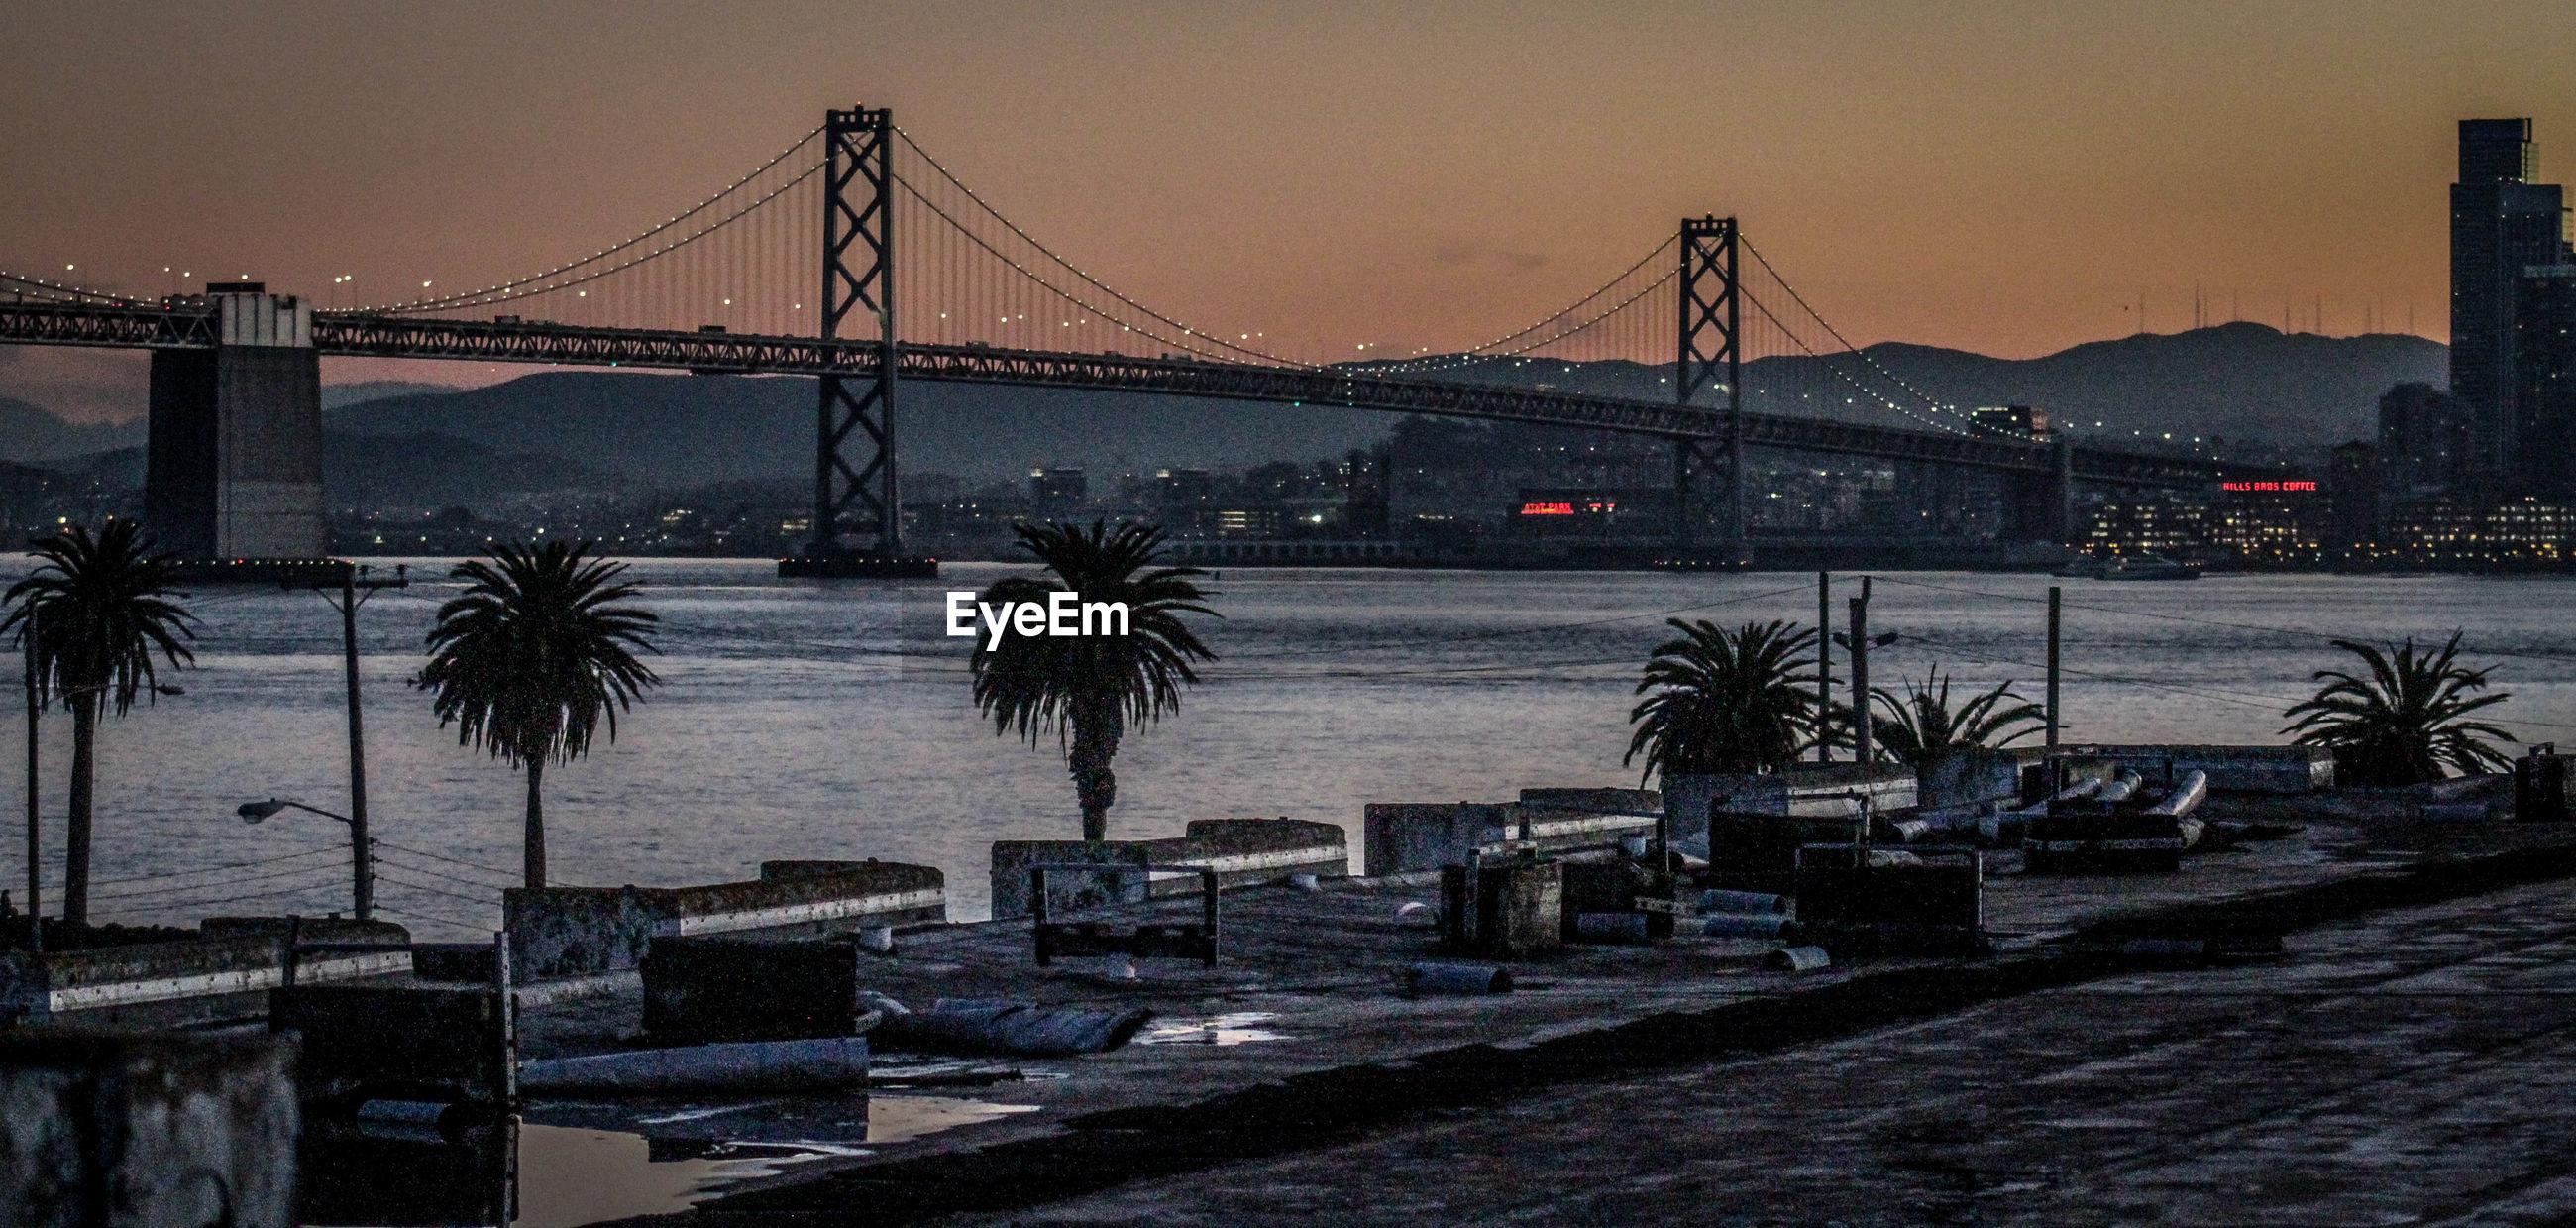 VIEW OF SUSPENSION BRIDGE AT WATERFRONT